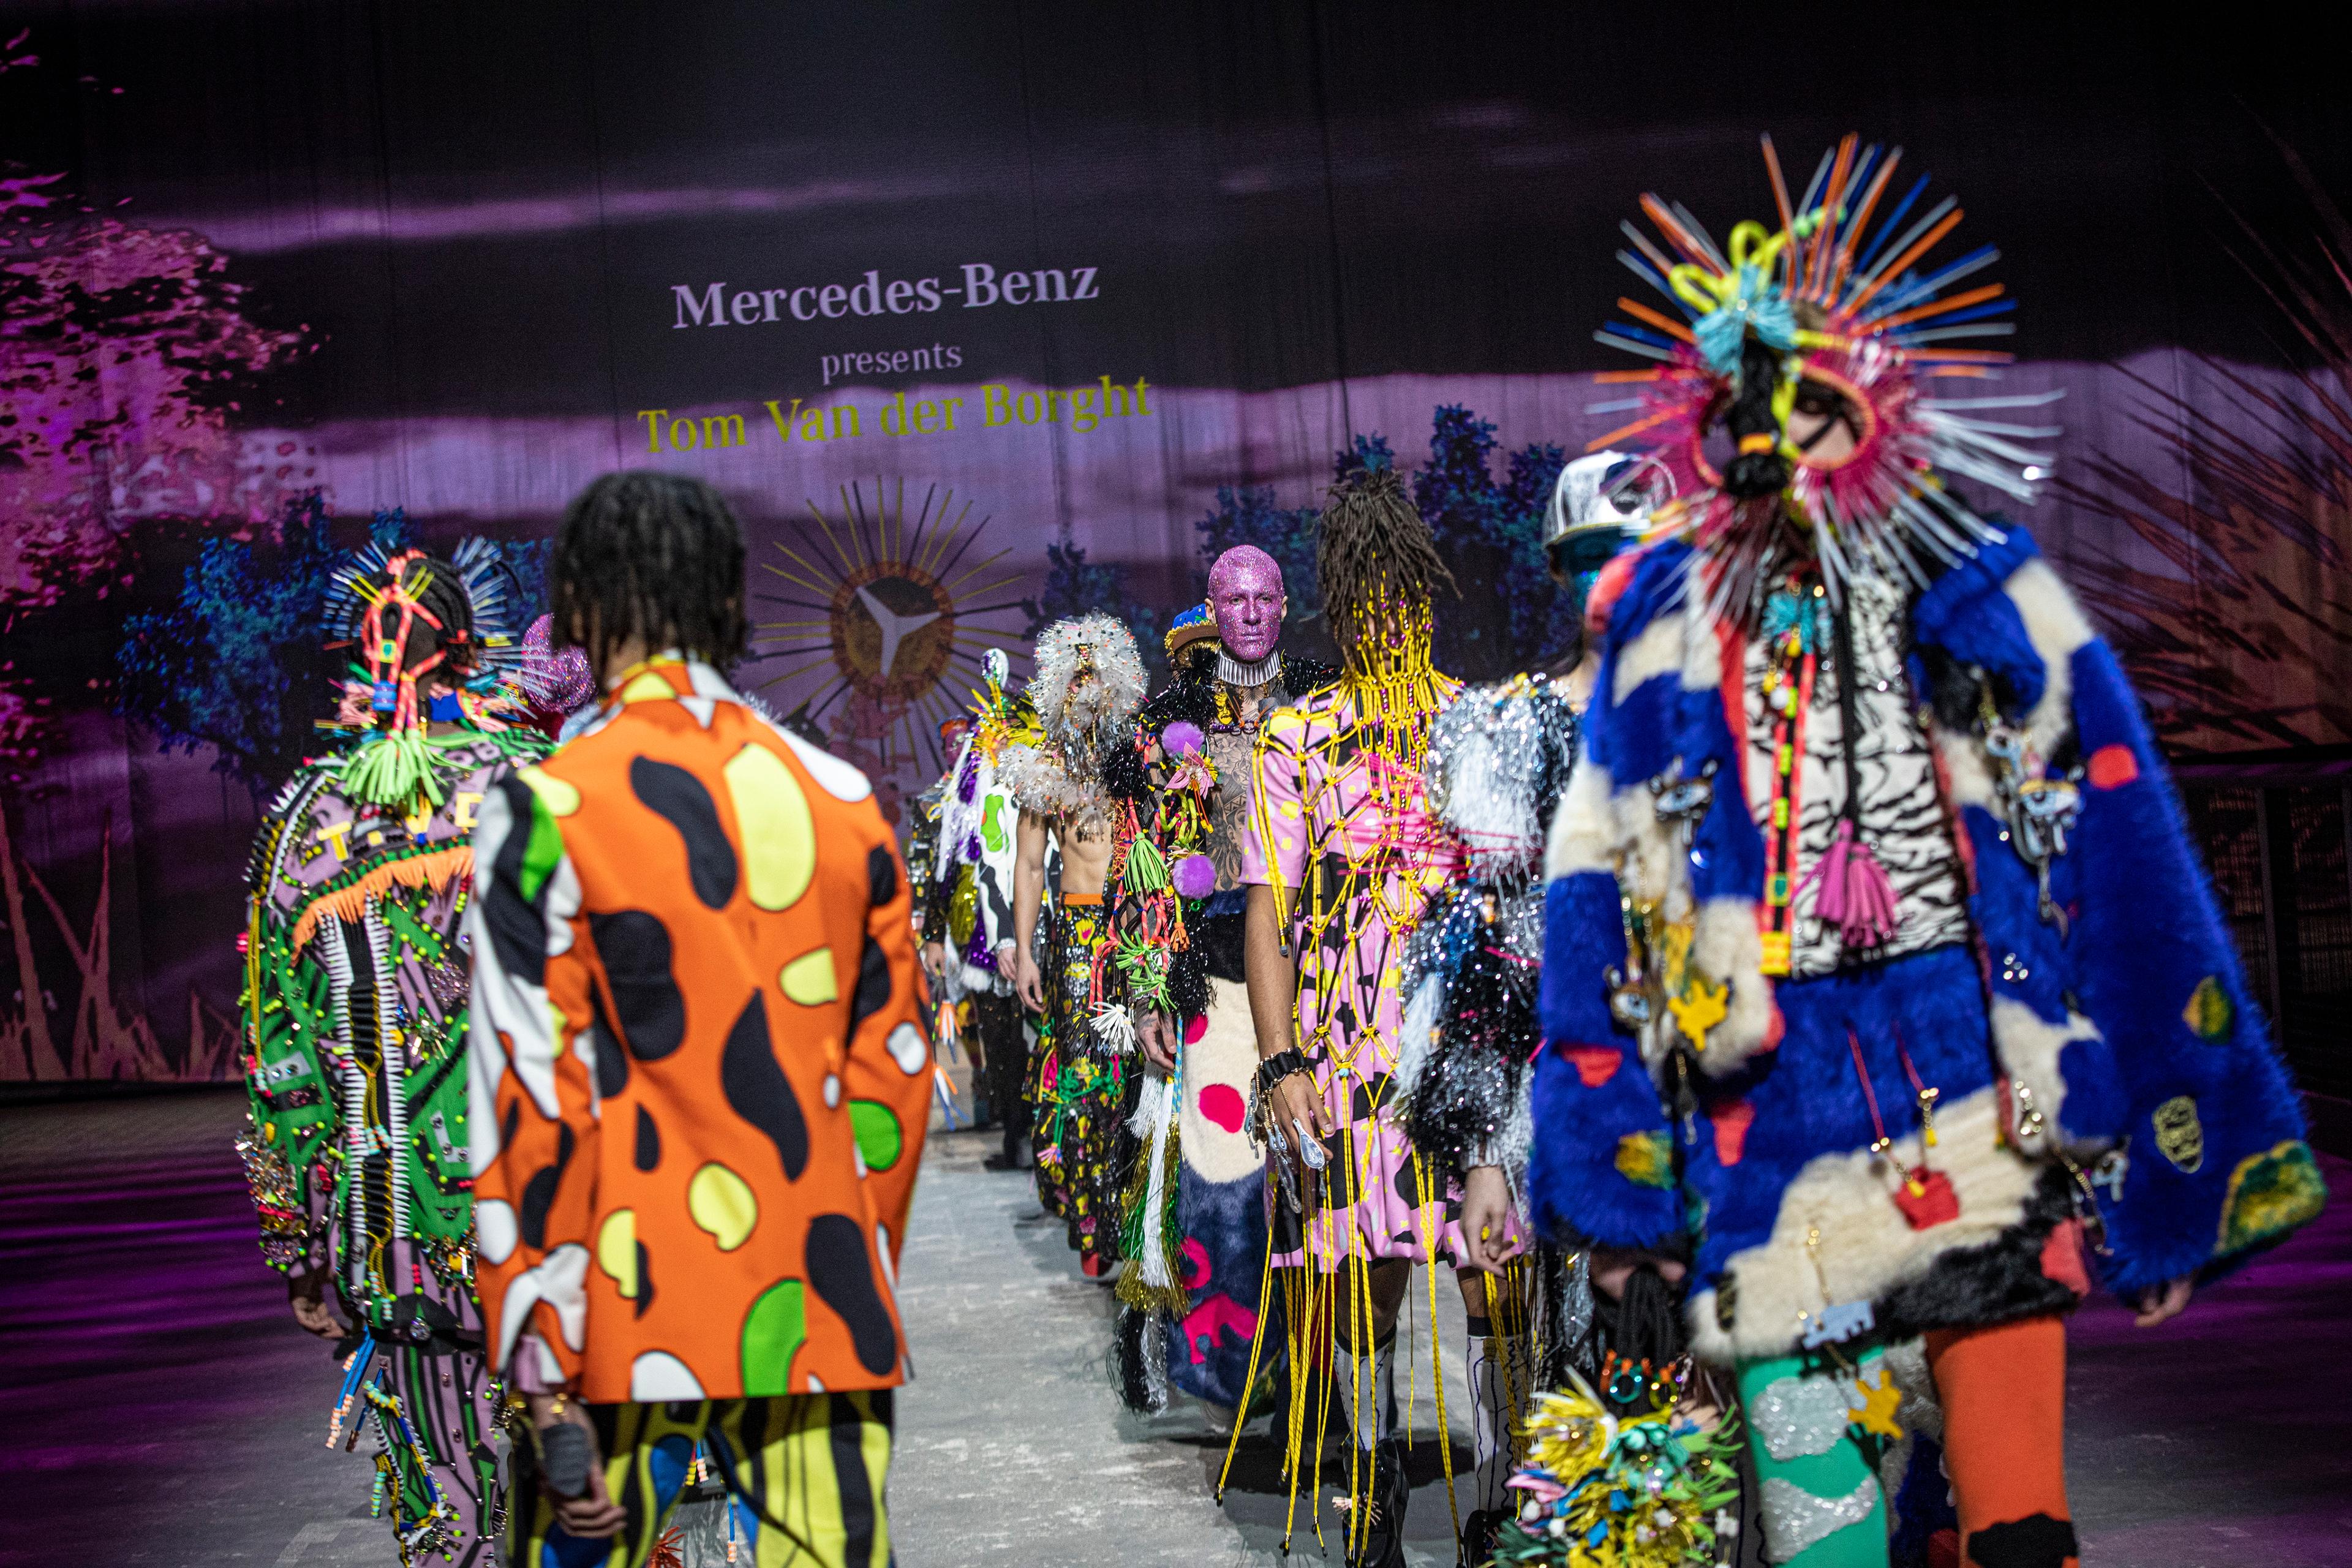 Mercedes-Benz Fashion Week x Tom Van der Borght - MBFW Berlin - 2021 - TVDB - collection - catwalk / défilé - preview / aperçu